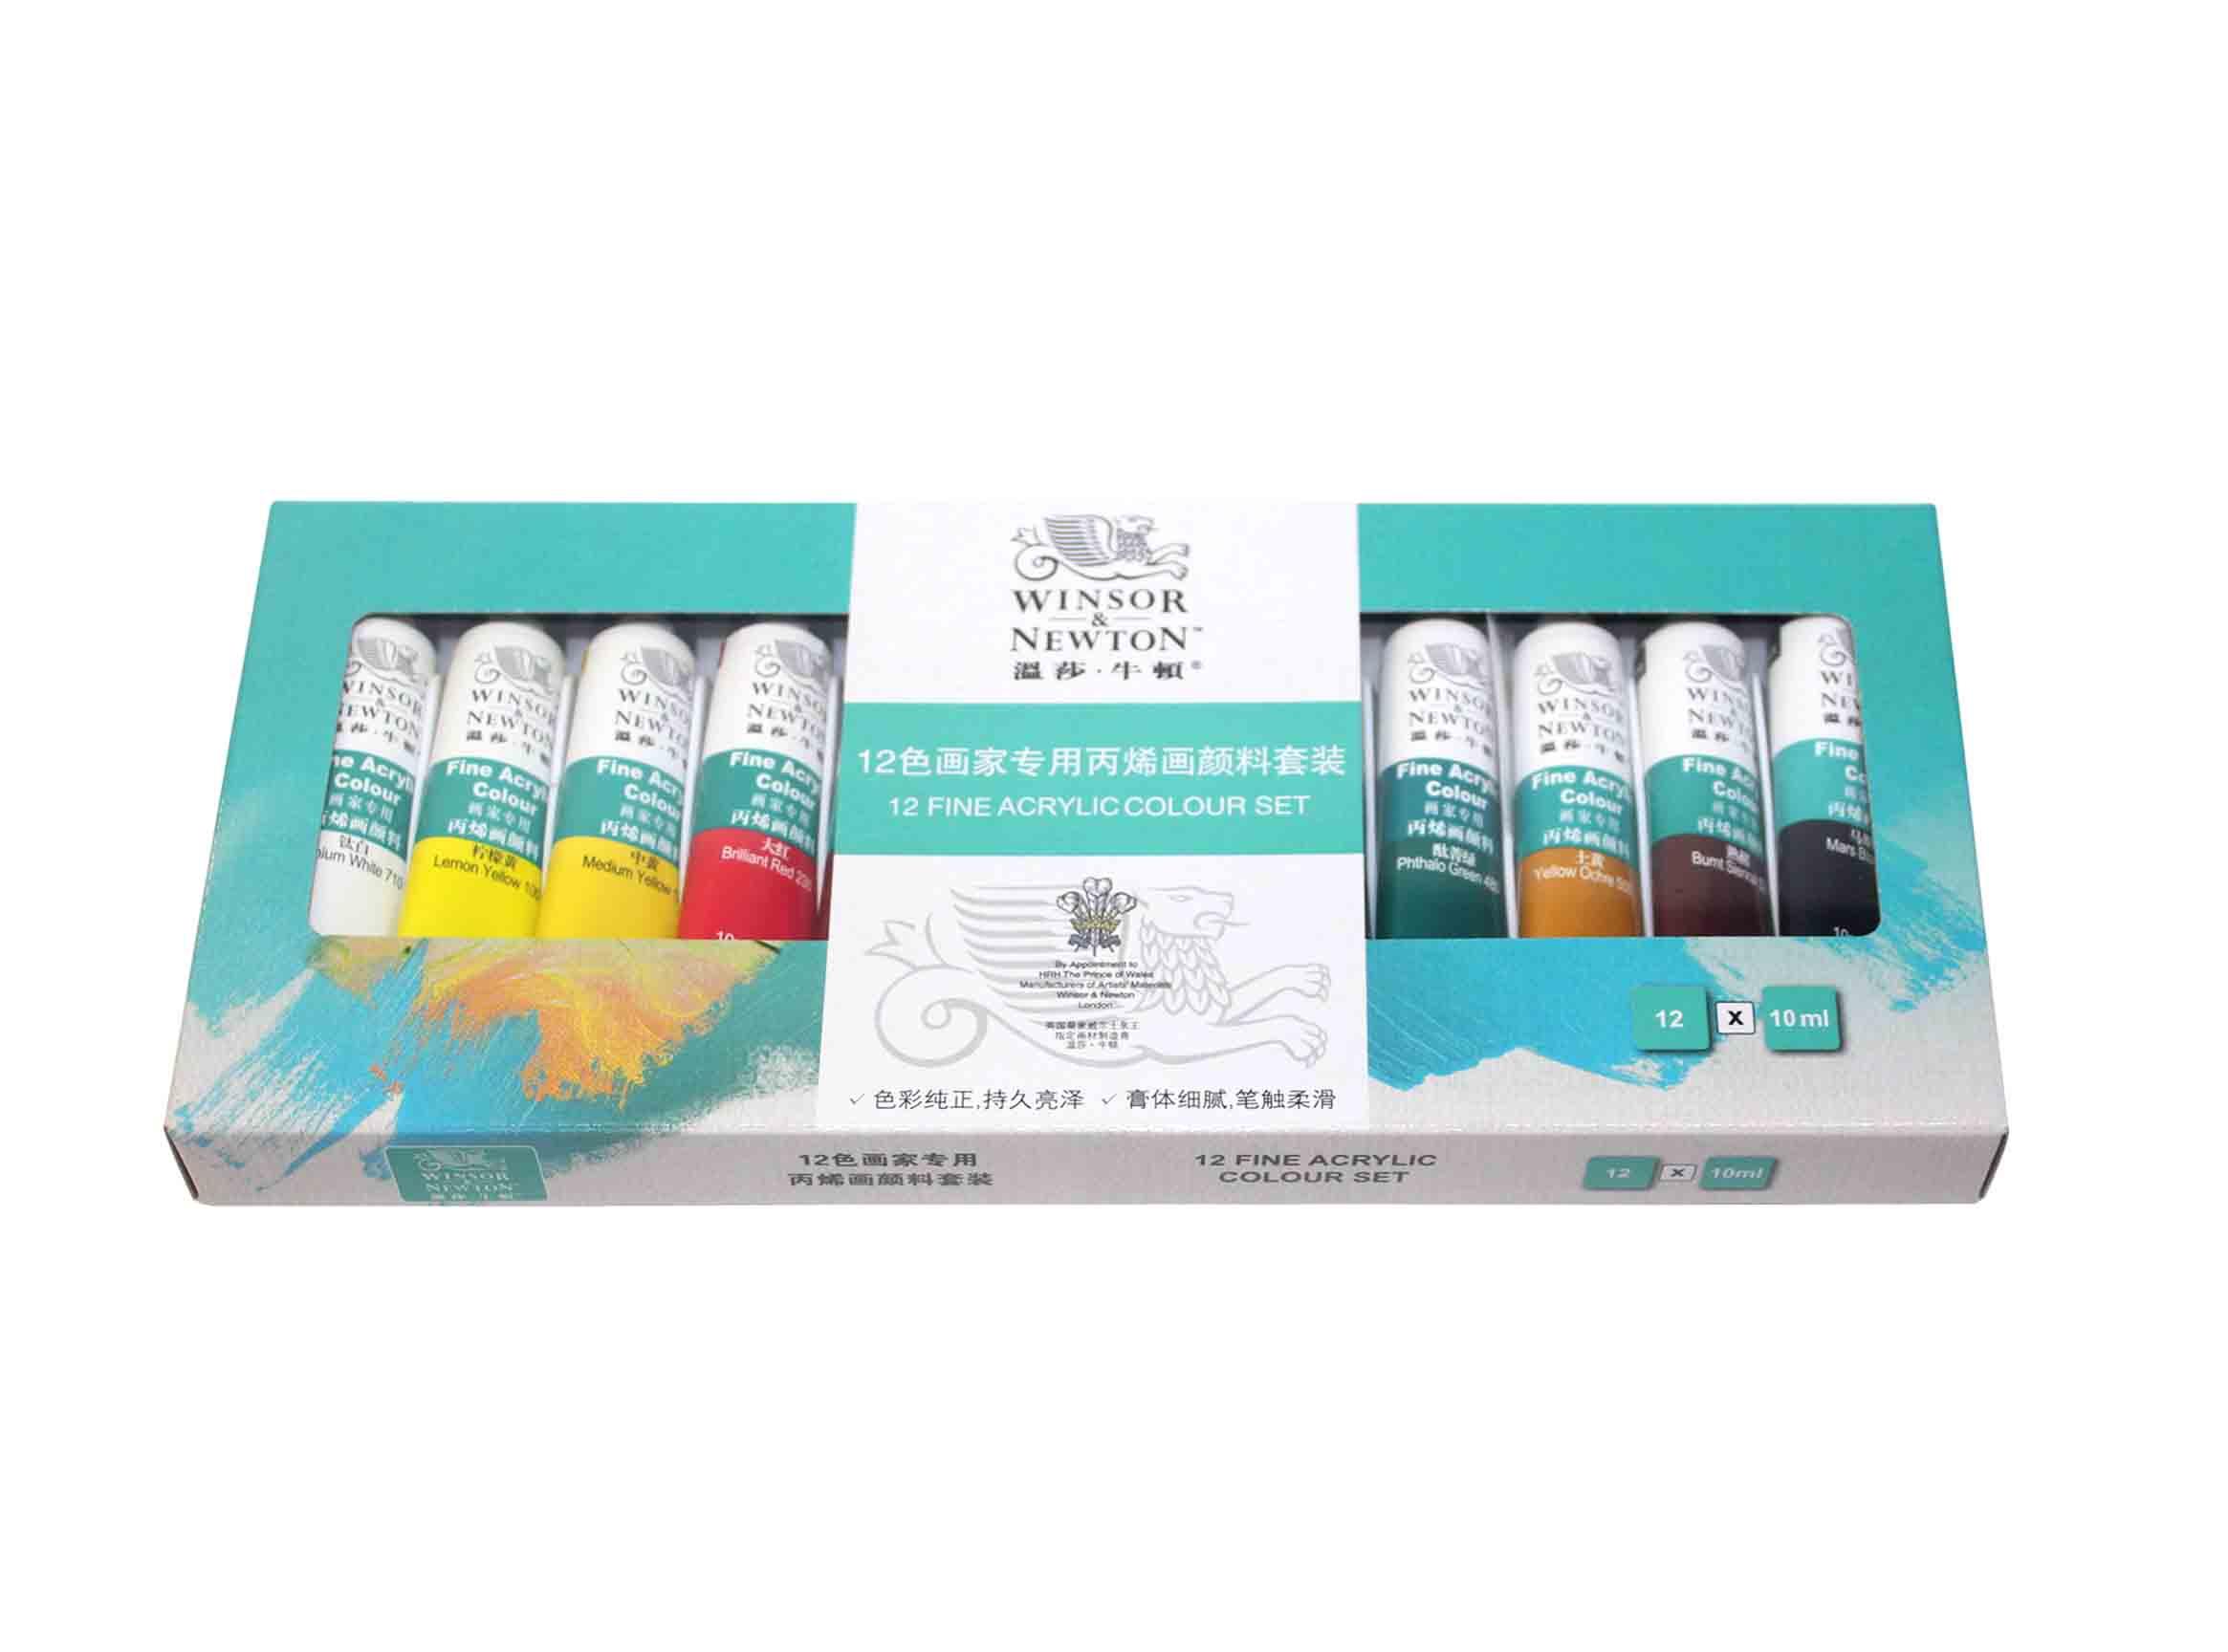 Winsor & Newton Fine Acrylic 12 Colour Set (10ml Tubes)